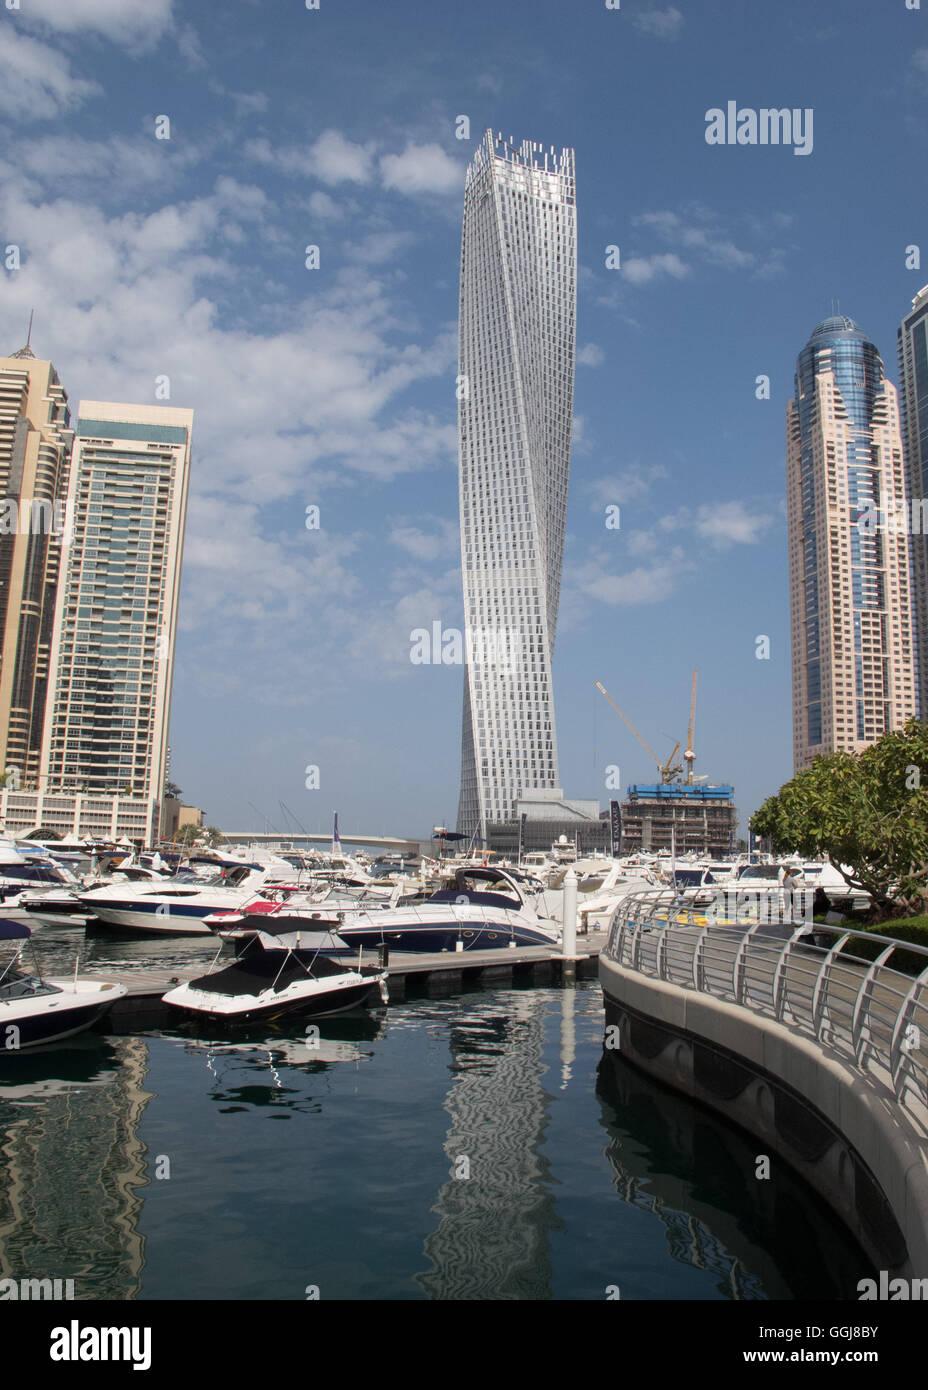 Cayan Tower in Dubai Marina, Dubai, UAE. - Stock Image